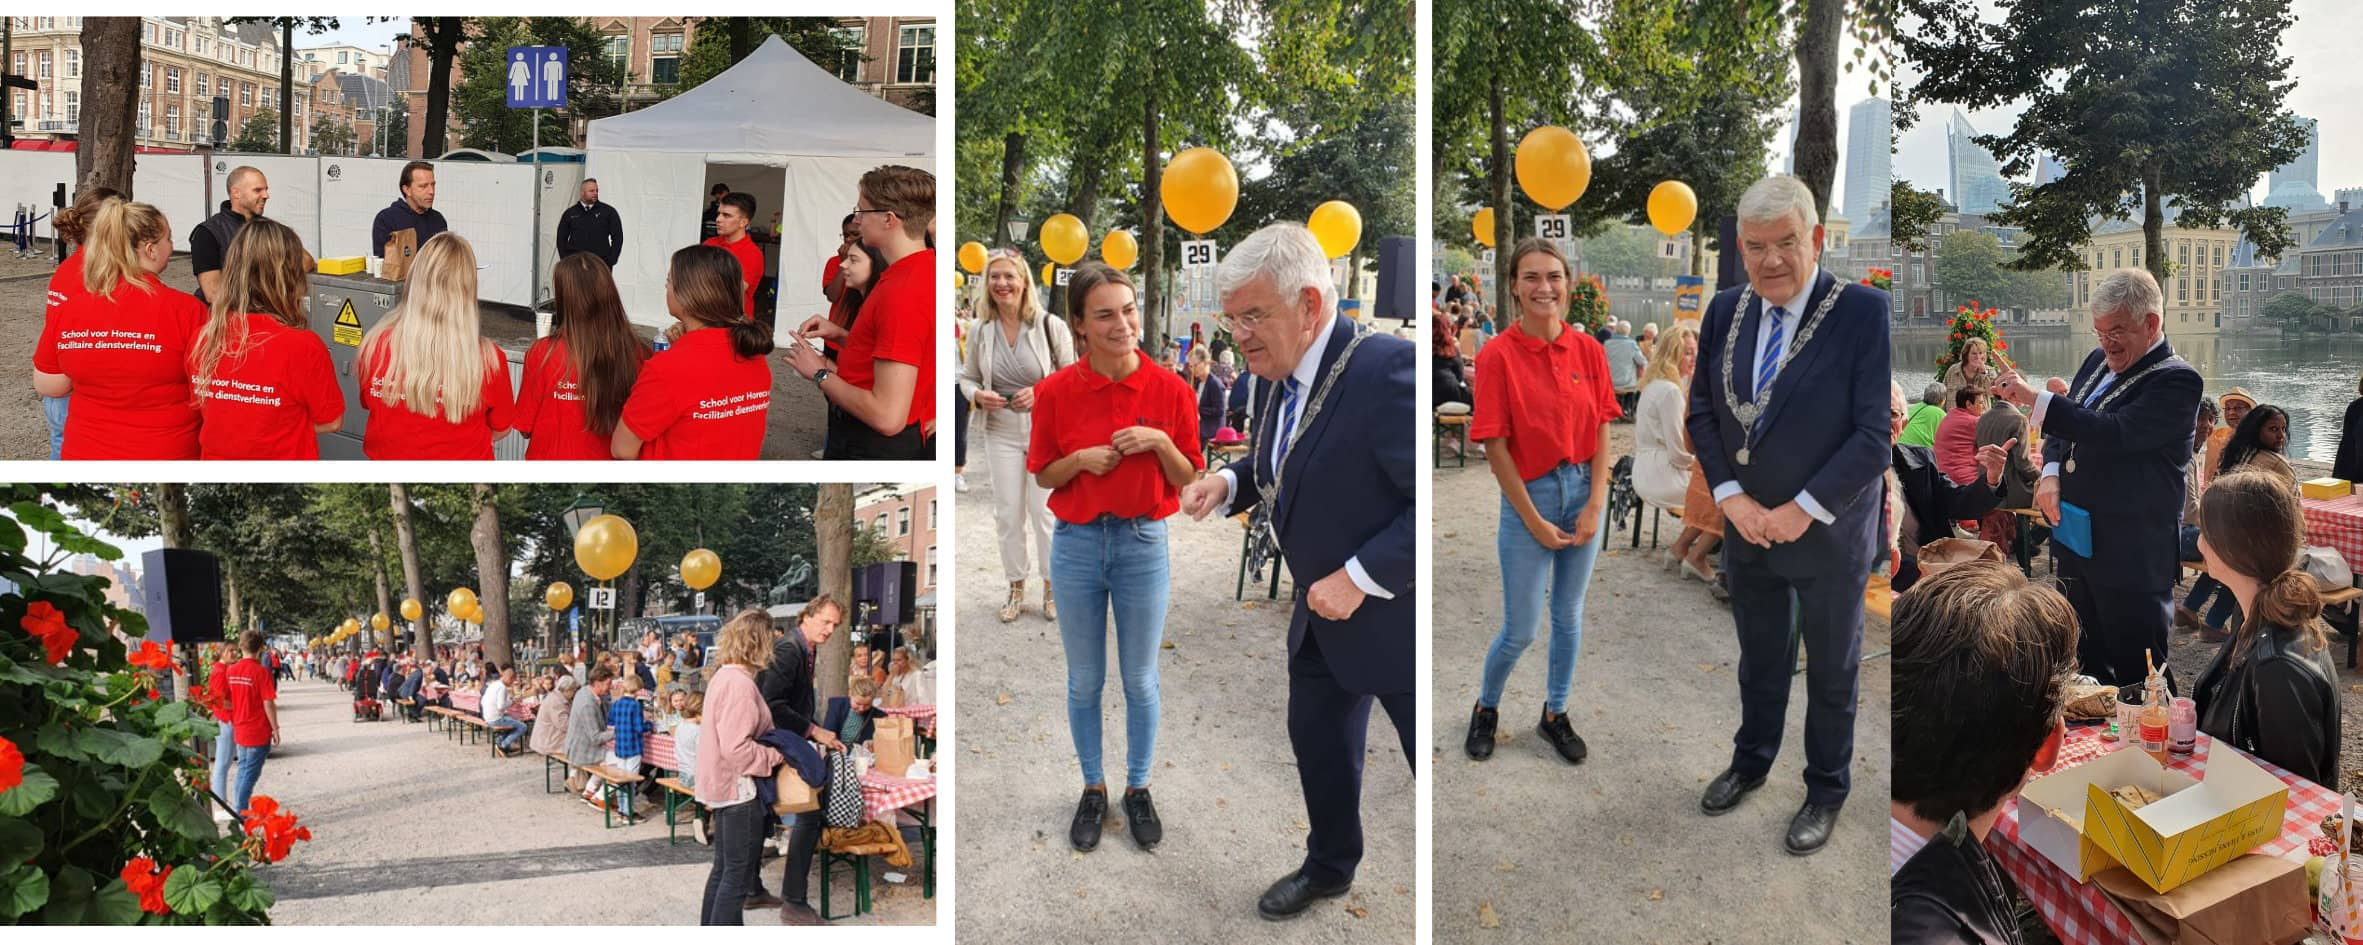 Studenten Allround Hospitality op Prinsjesontbijt 2021